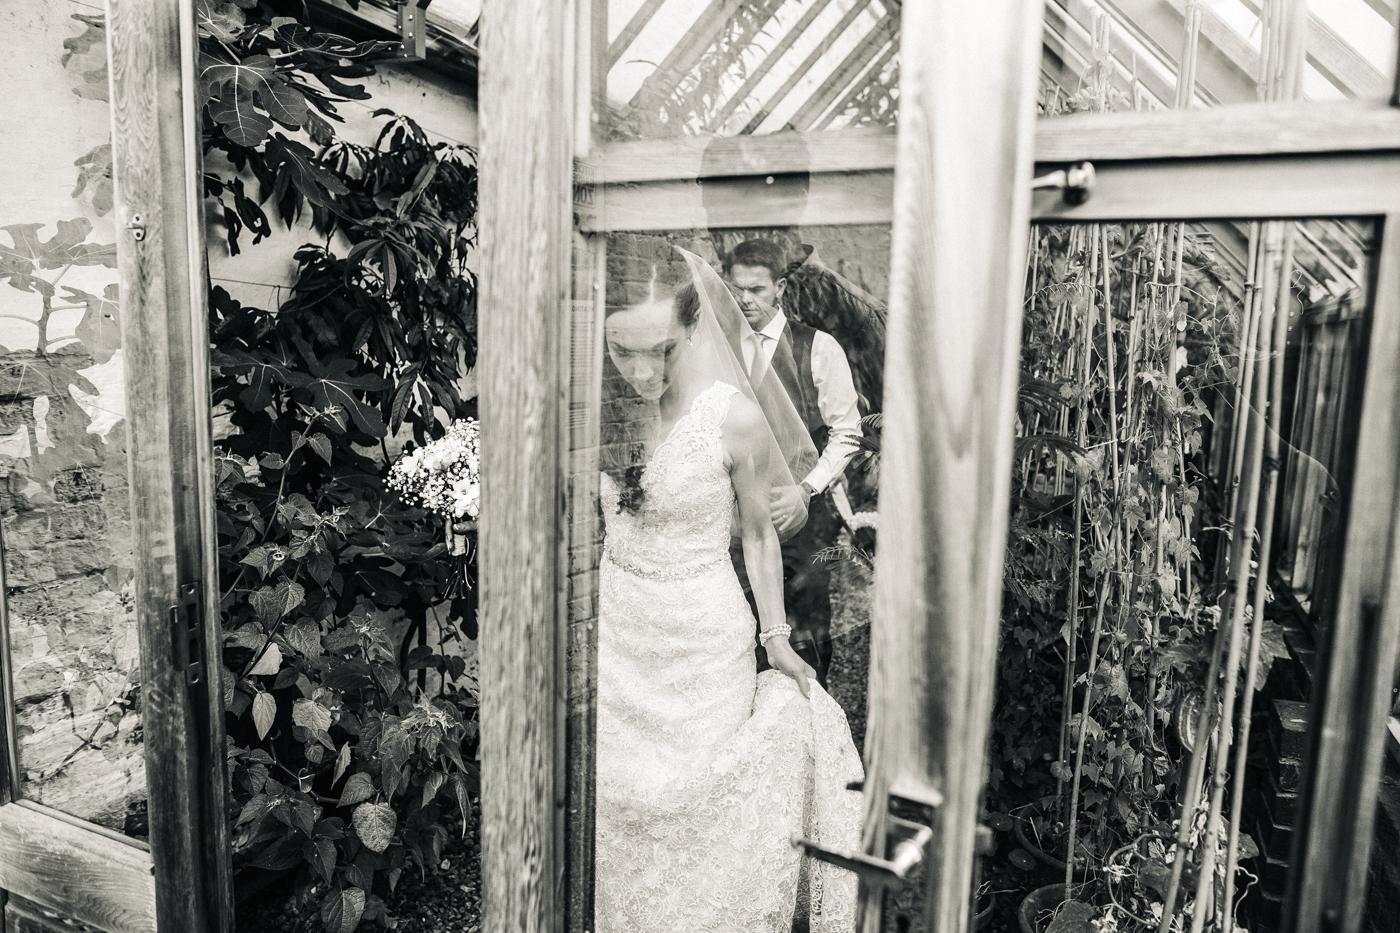 teesside-middlesbrough-north-east-wedding-photographer-creative-wedding-venues-0026.jpg